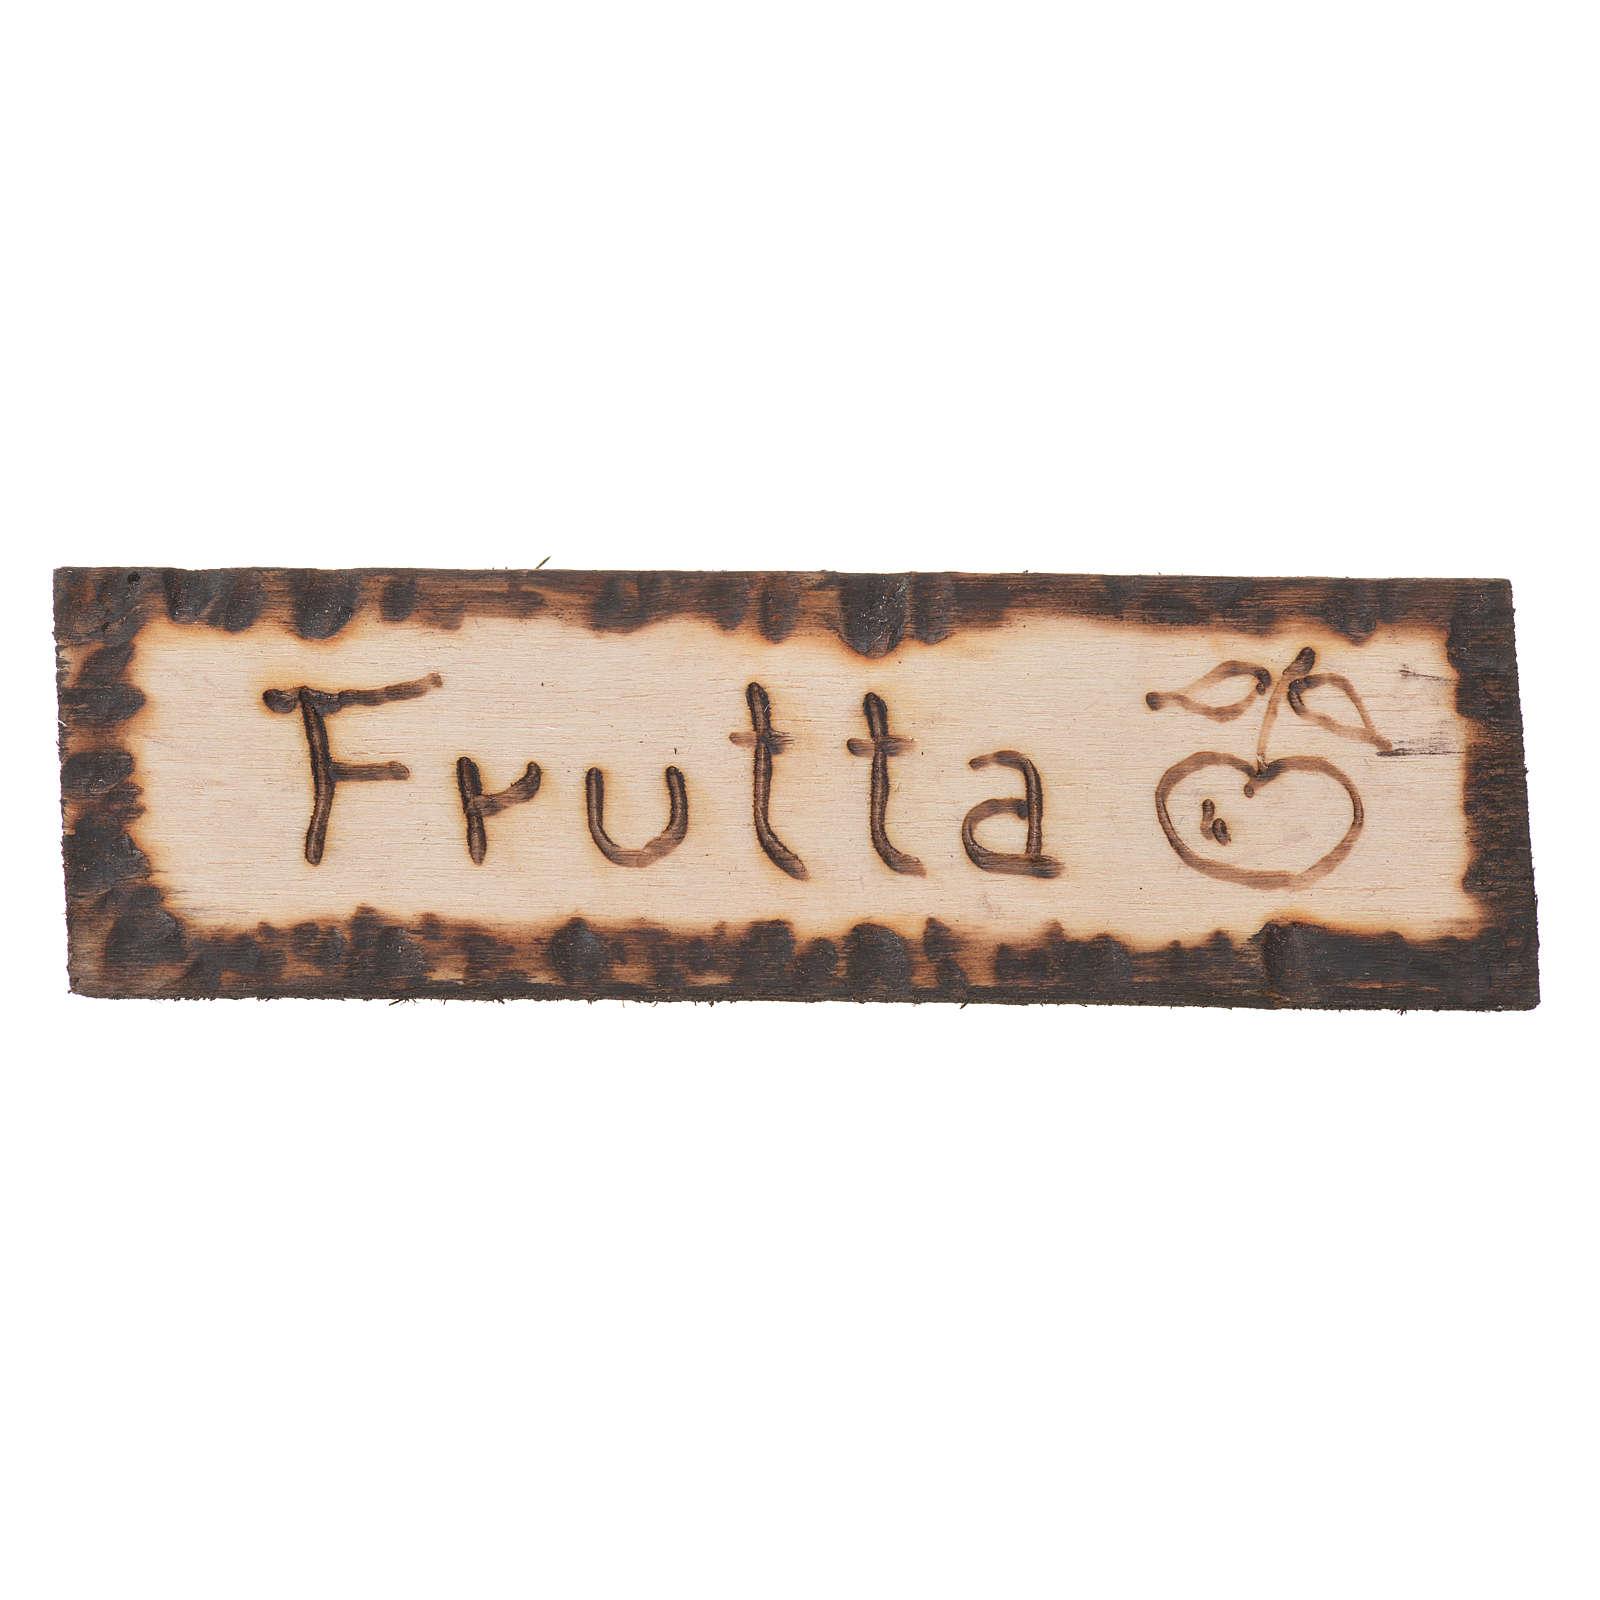 Fruit shop wooden sign, 2.5x9cm for nativities 4